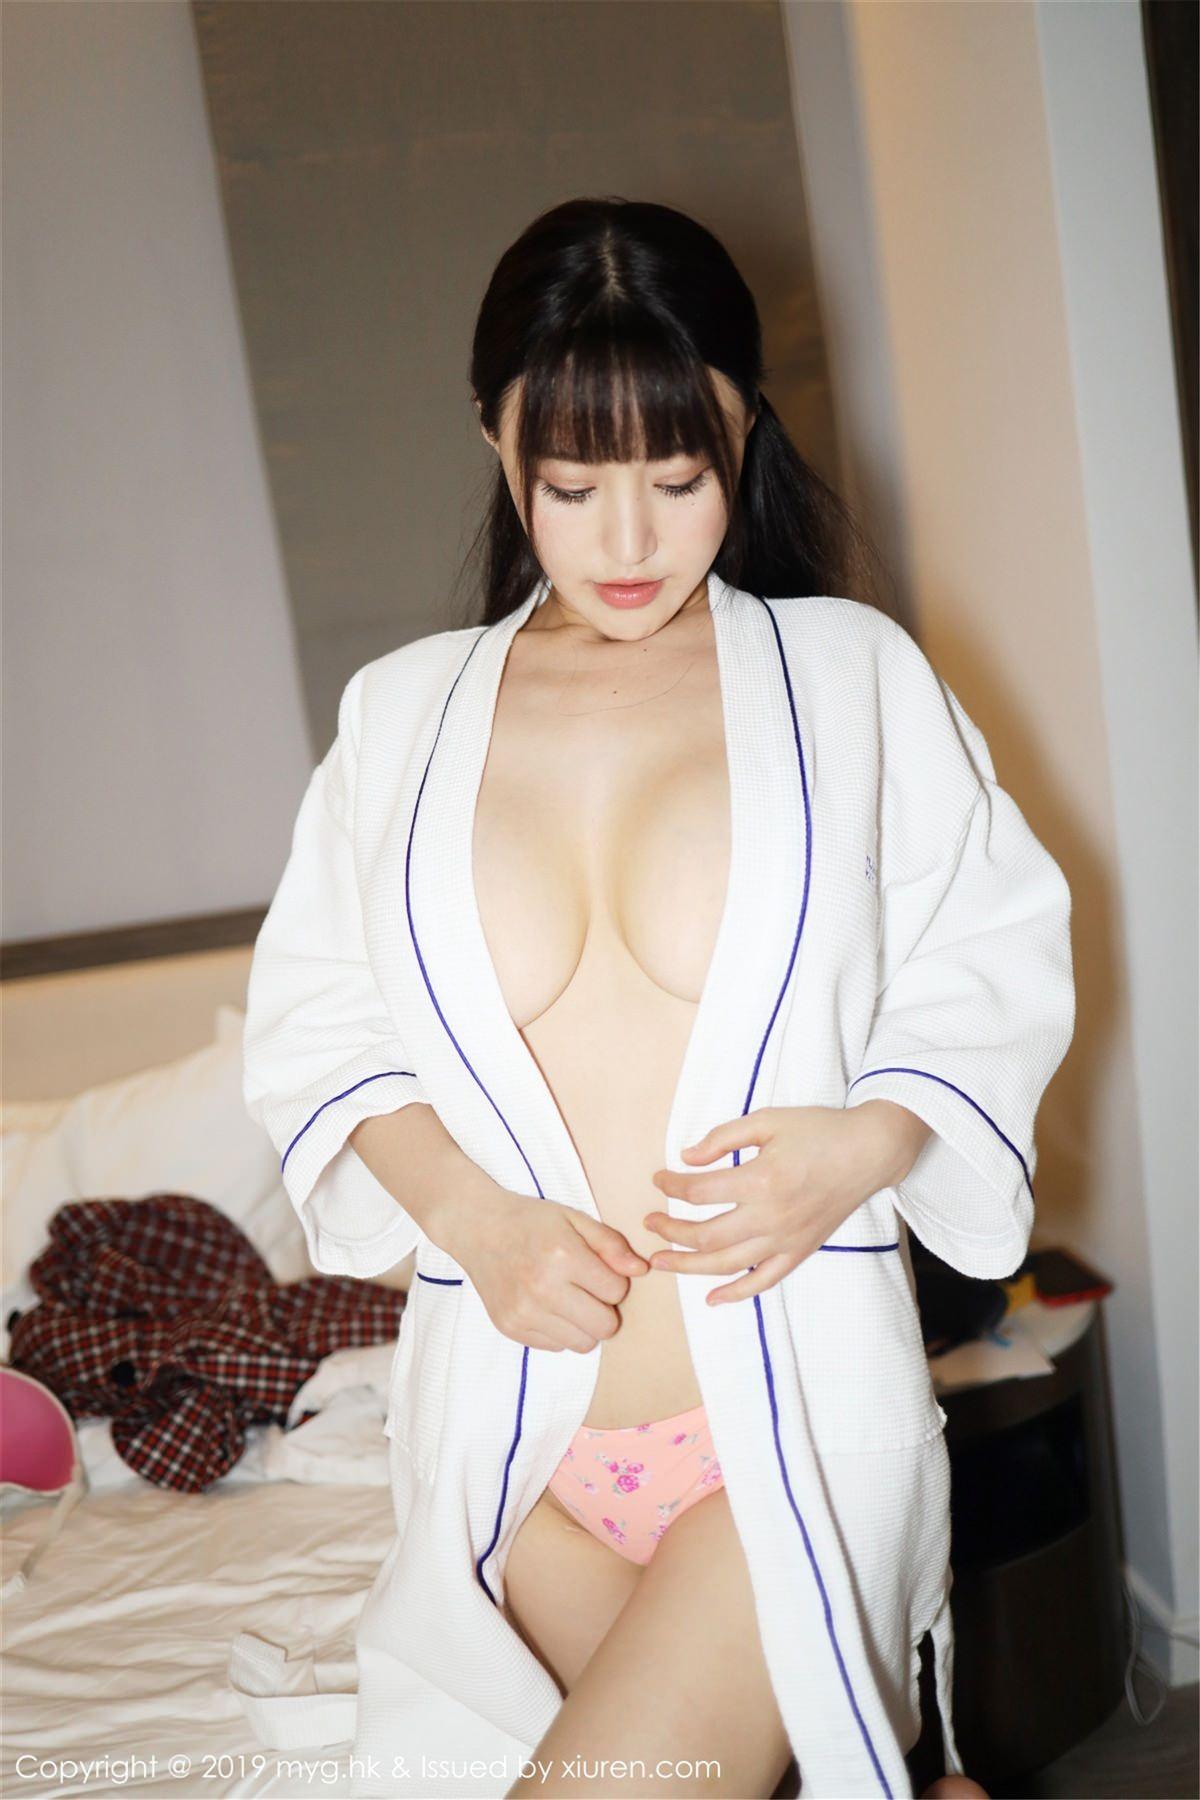 MyGirl Vol.363 50P, mygirl, Zhu Ke Er